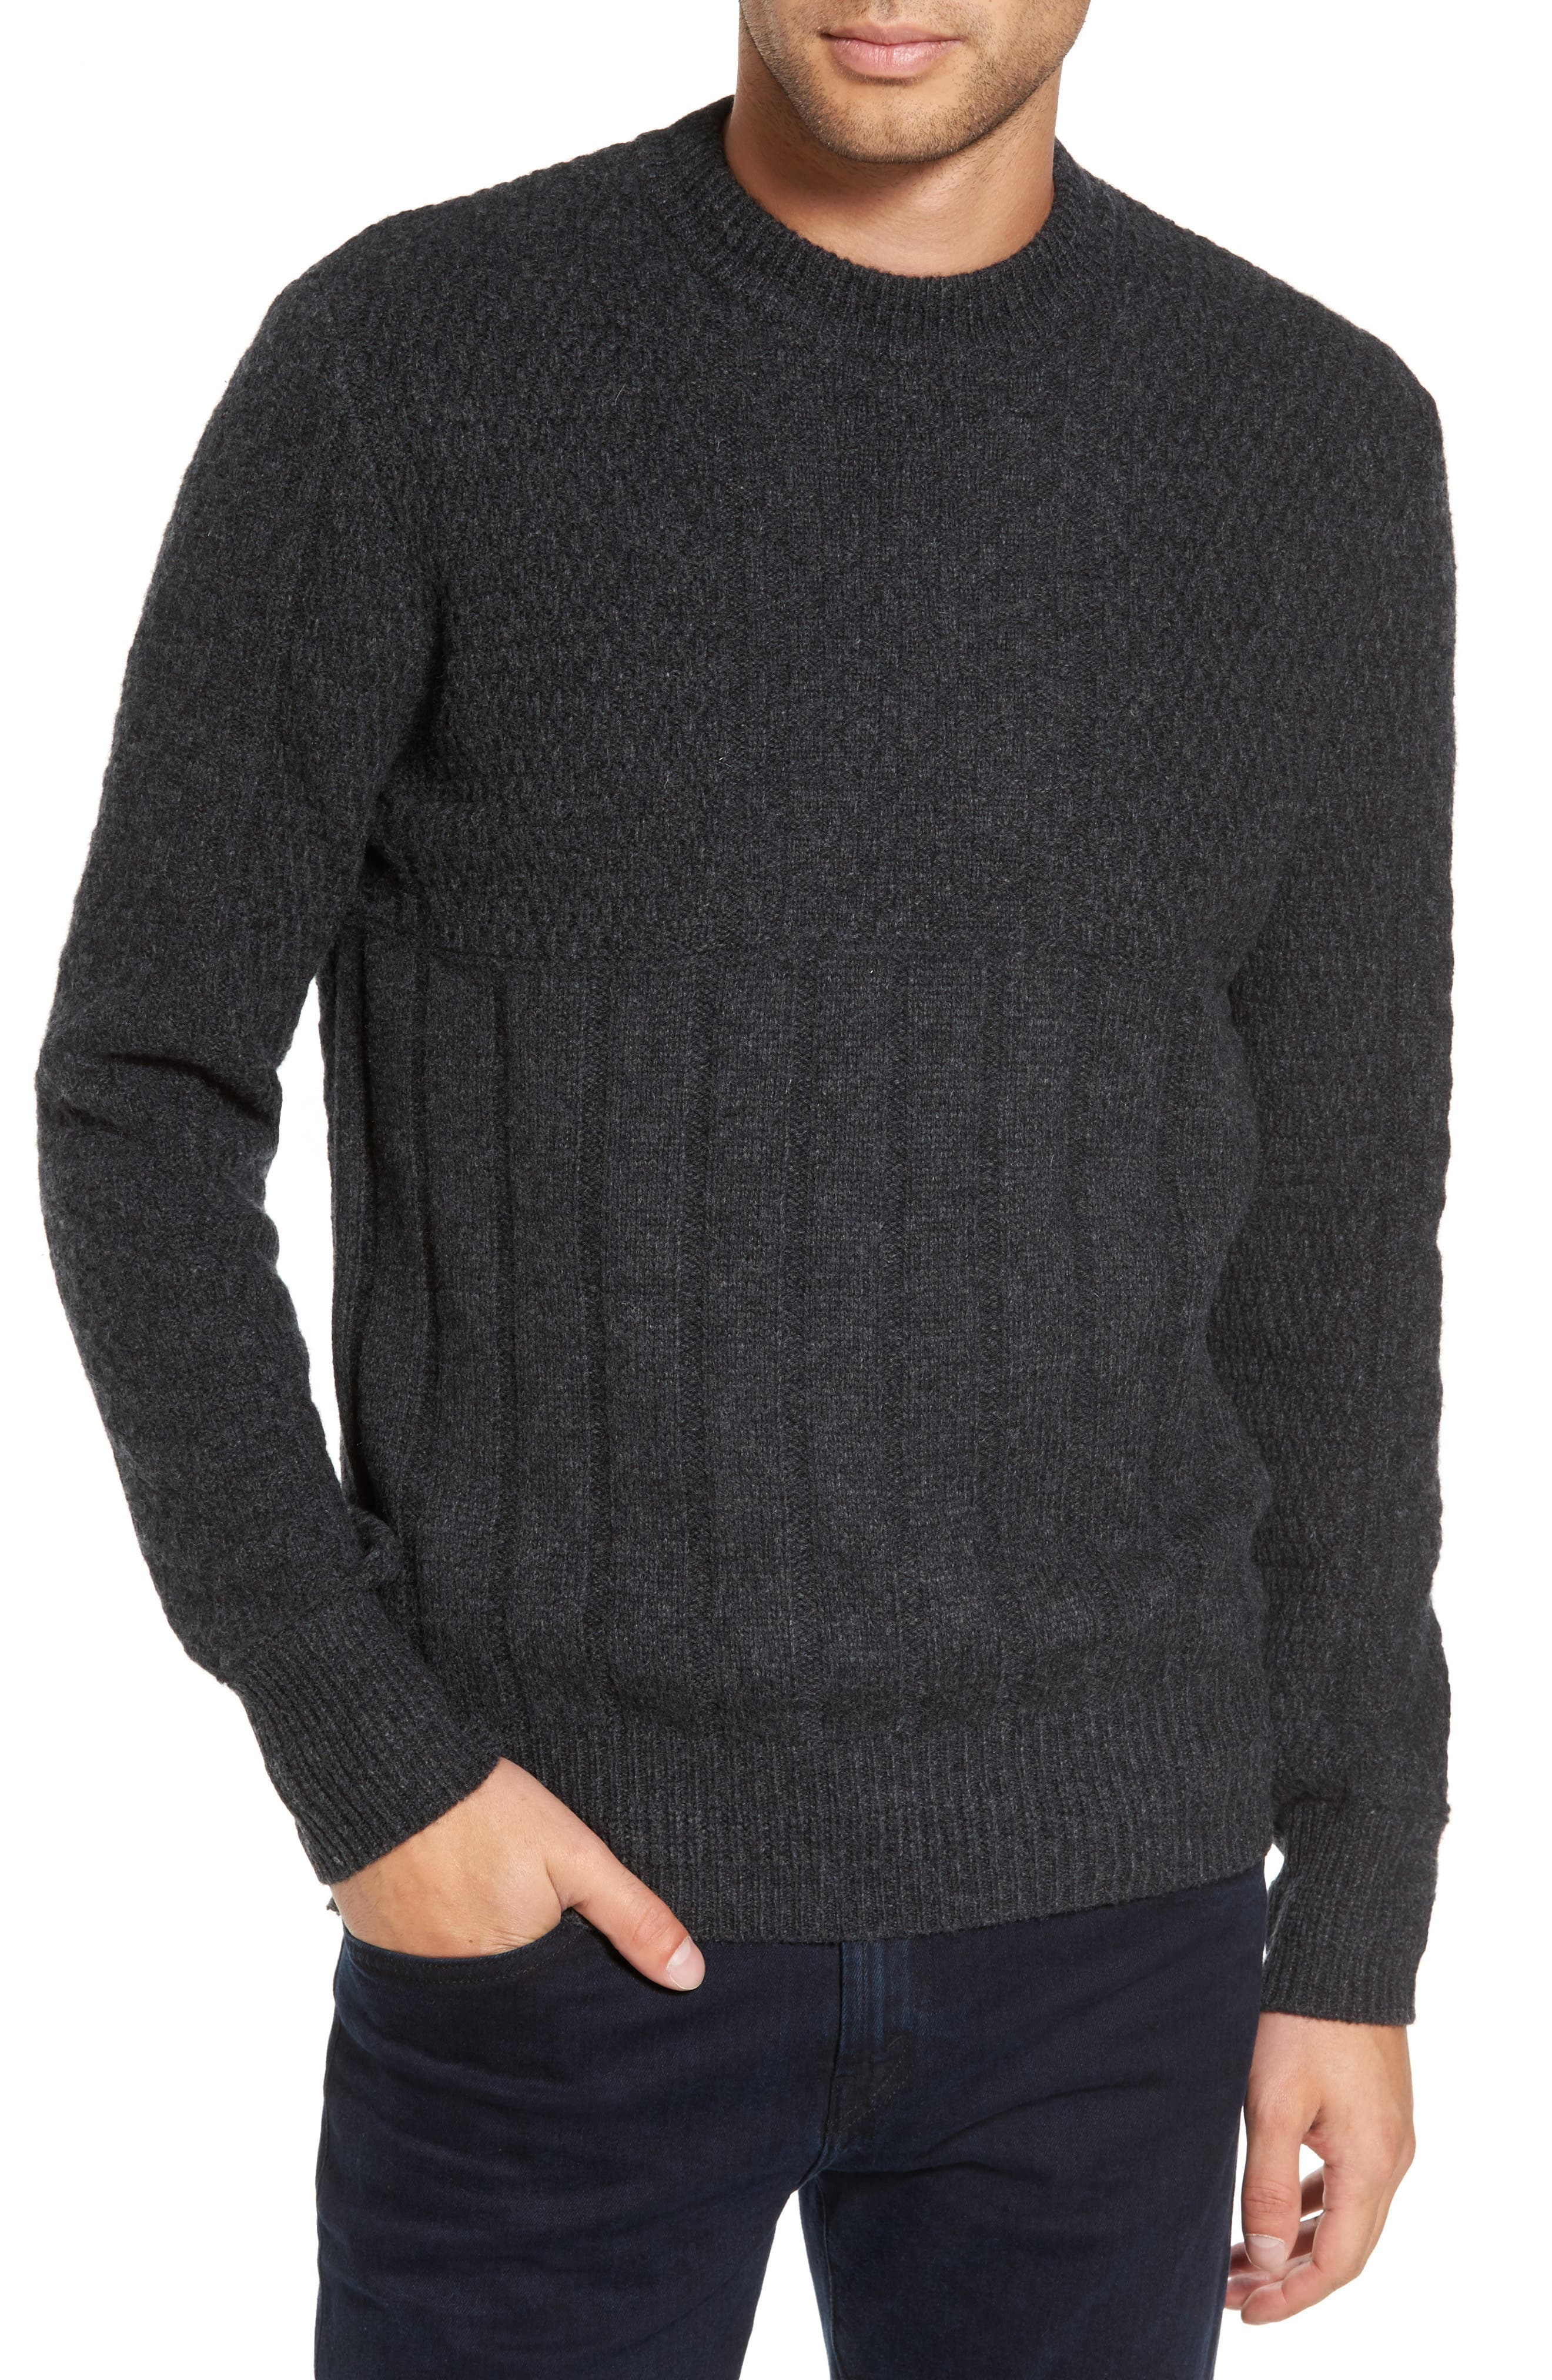 Slate & Stone Wool Crewneck Sweater